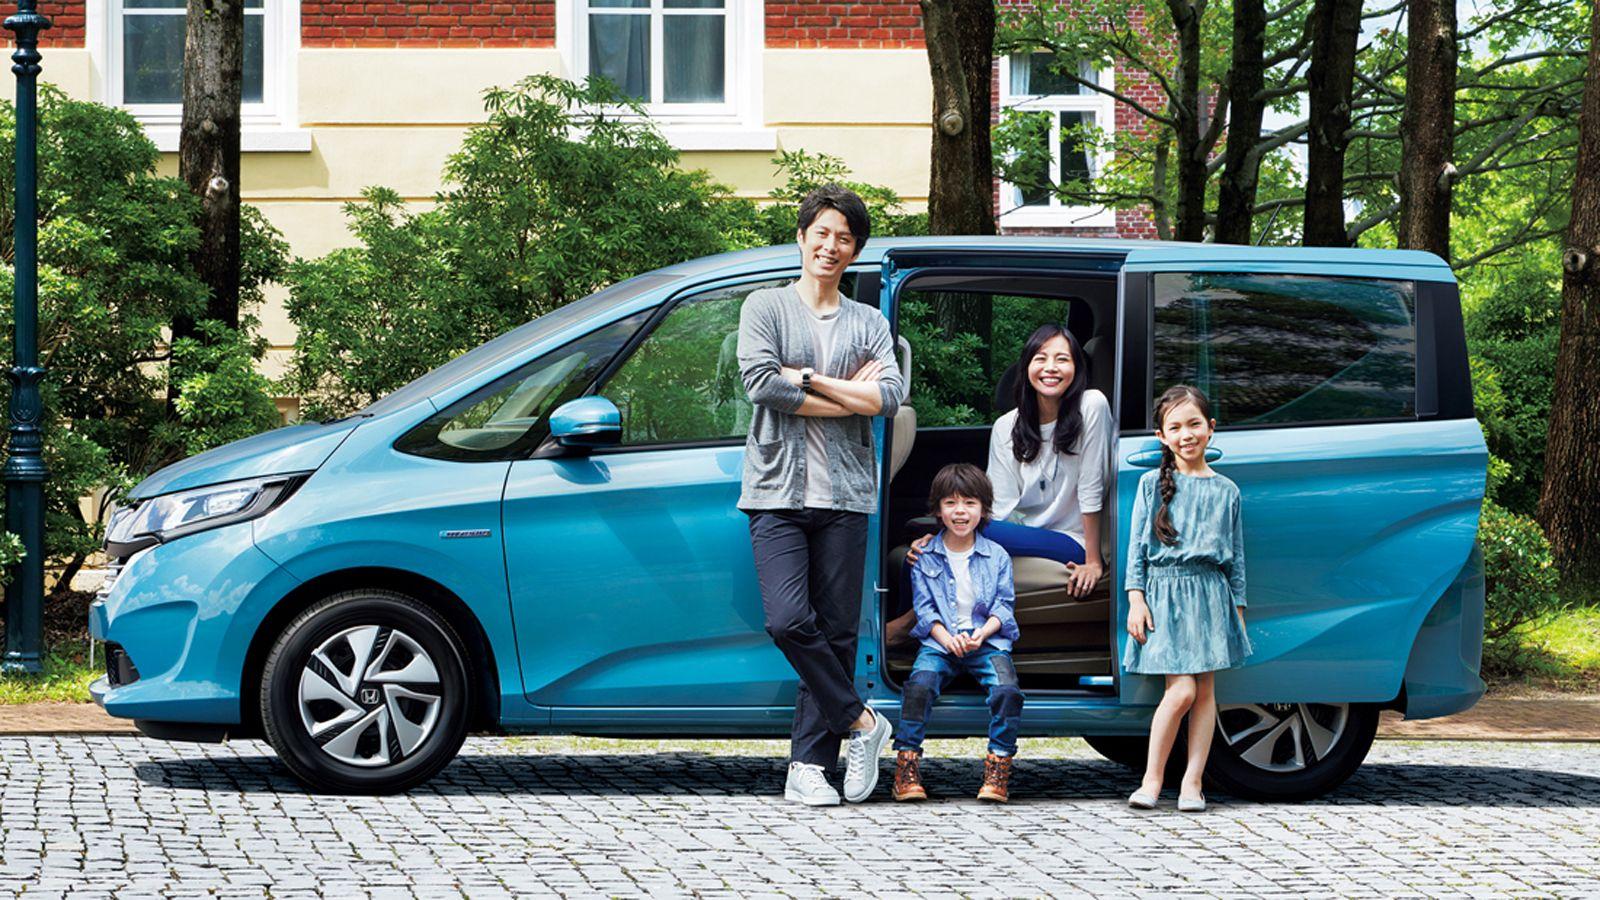 машина для всей семьи фото очень живо представляла